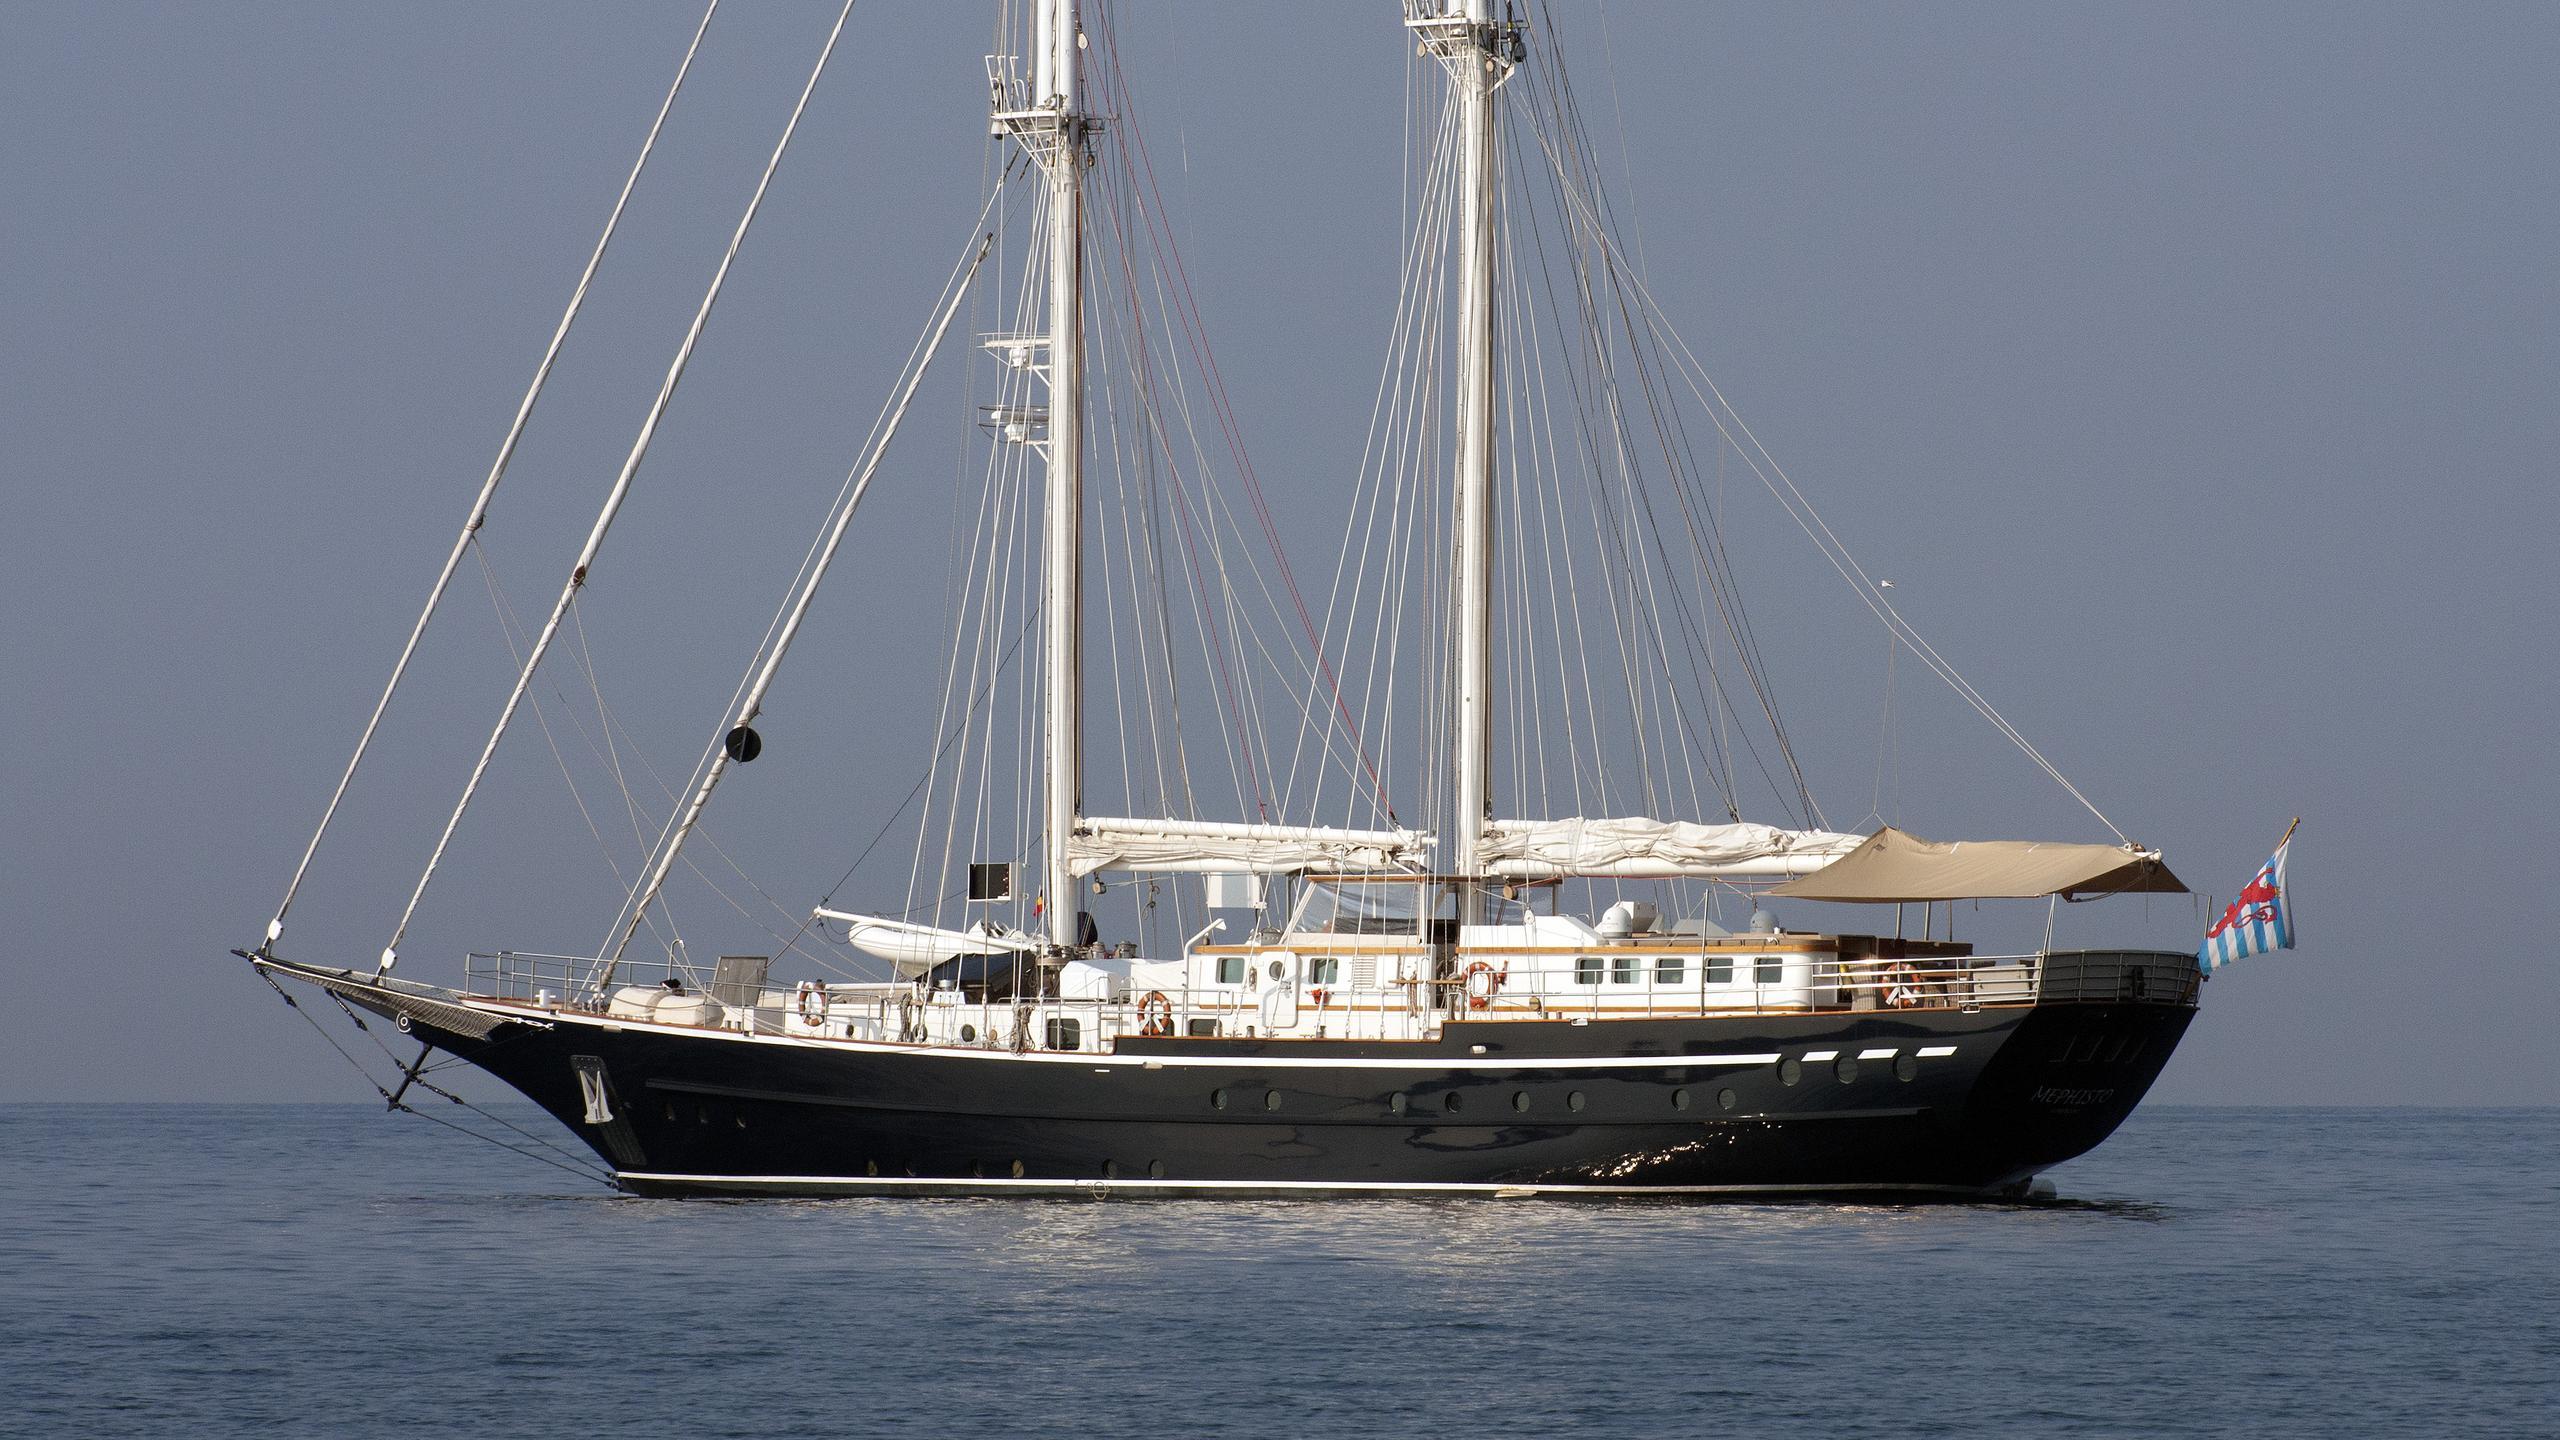 mephisto-sailing-yacht-vace-2002-43m-profile